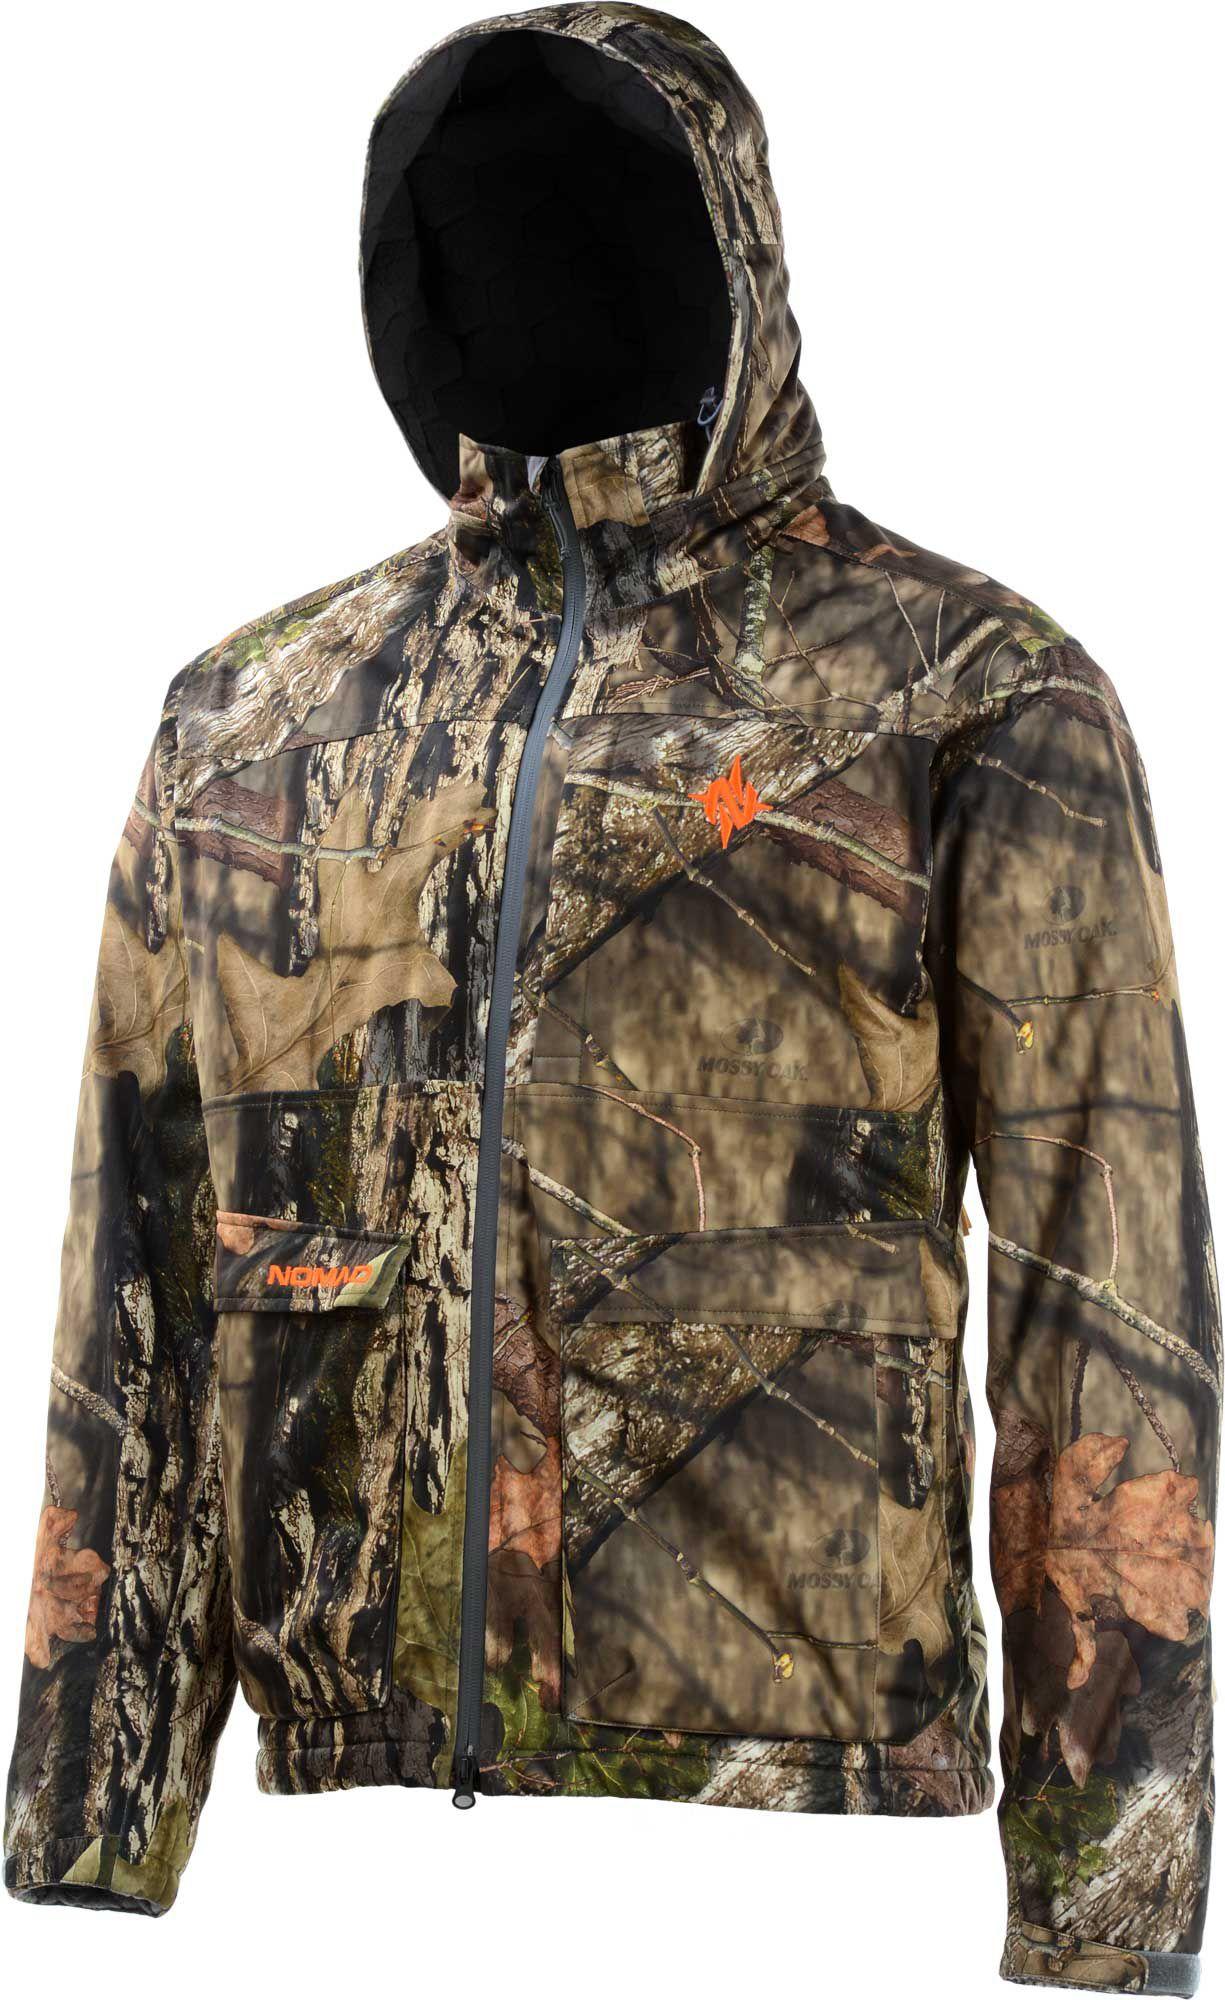 NOMAD Conifer Jacket, Men's, Size: Medium, Mossy Oak Breakup Country